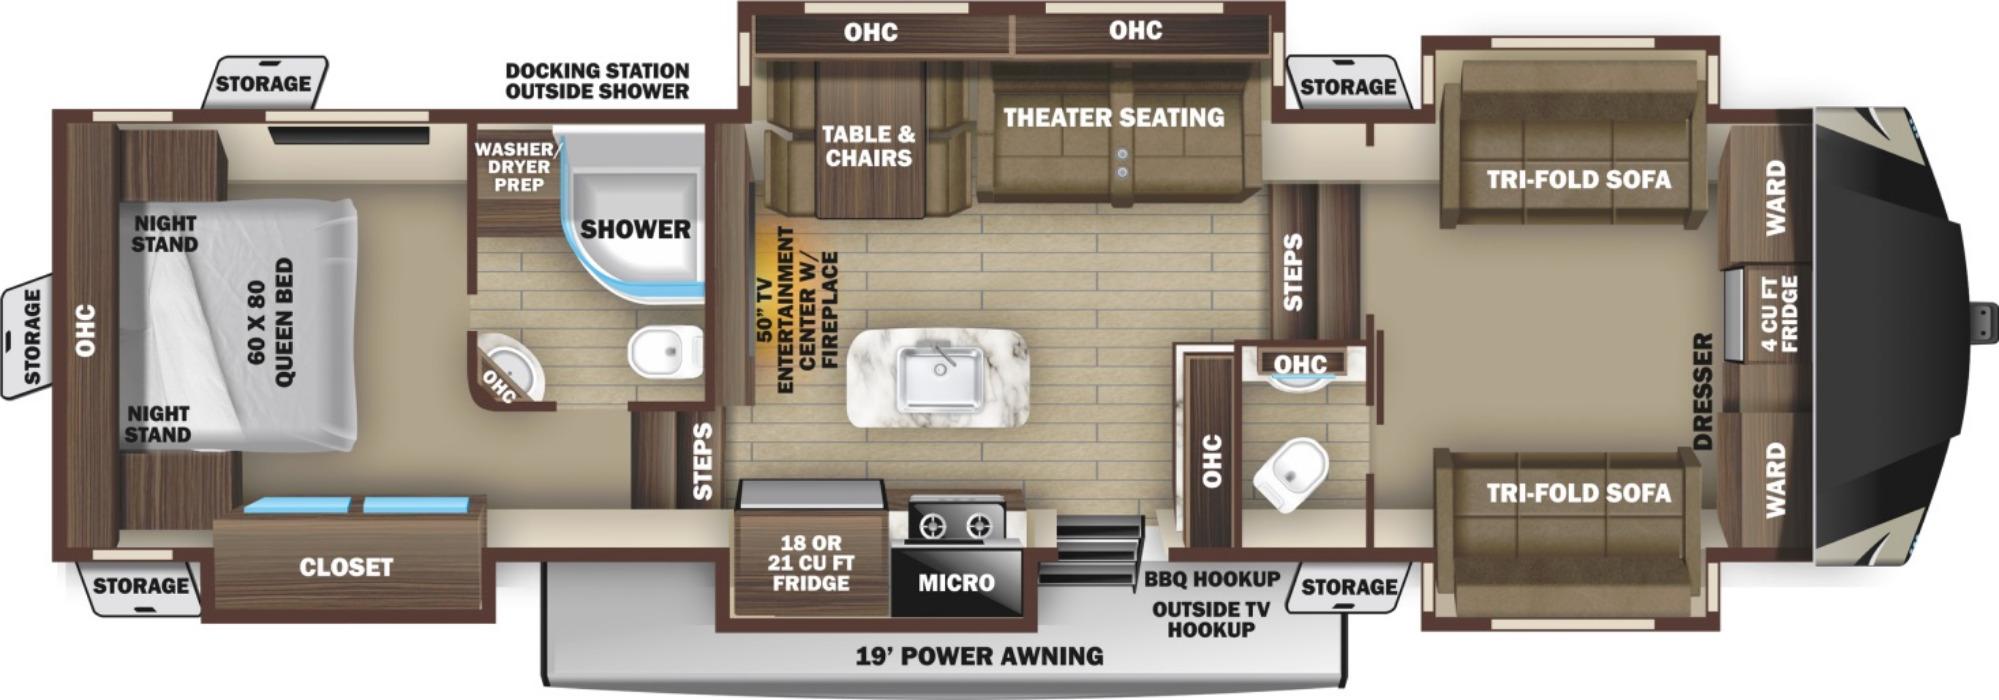 View Floor Plan for 2021 HIGHLAND RIDGE OPEN RANGE 376FBH